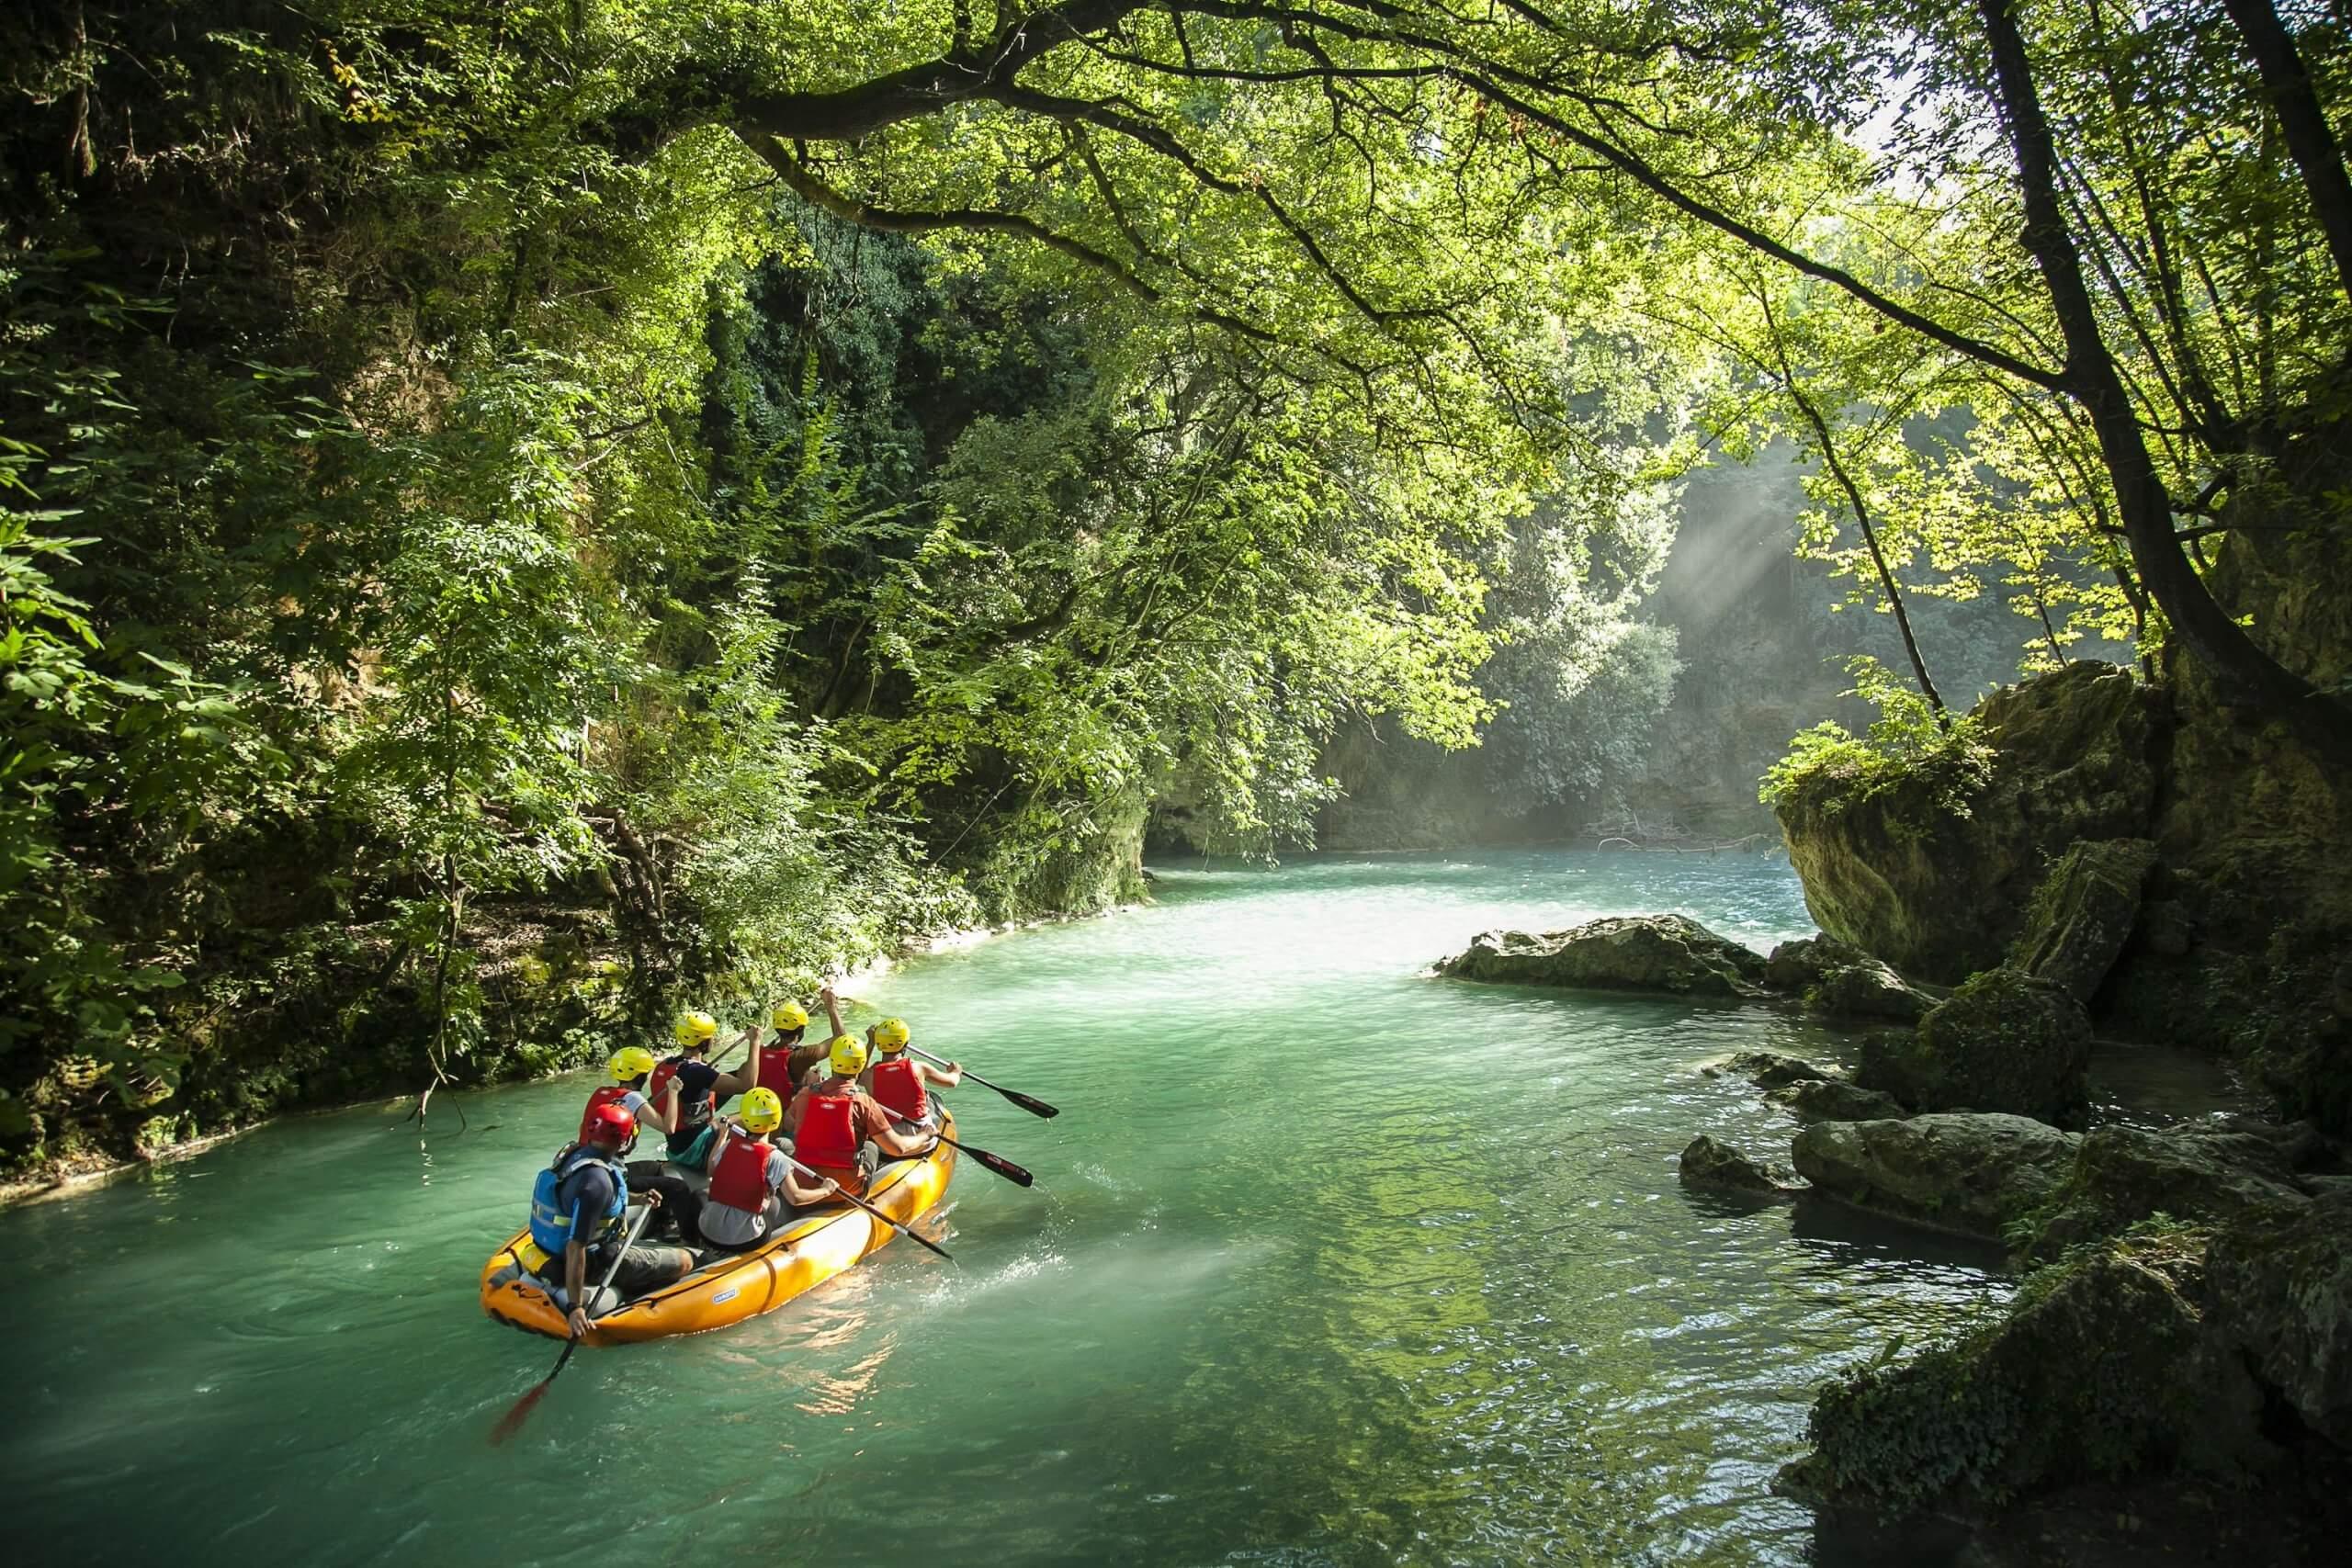 Rafting lungo le acque del fiume Elsa nel Parco fluviale di Colle Val d'Elsa